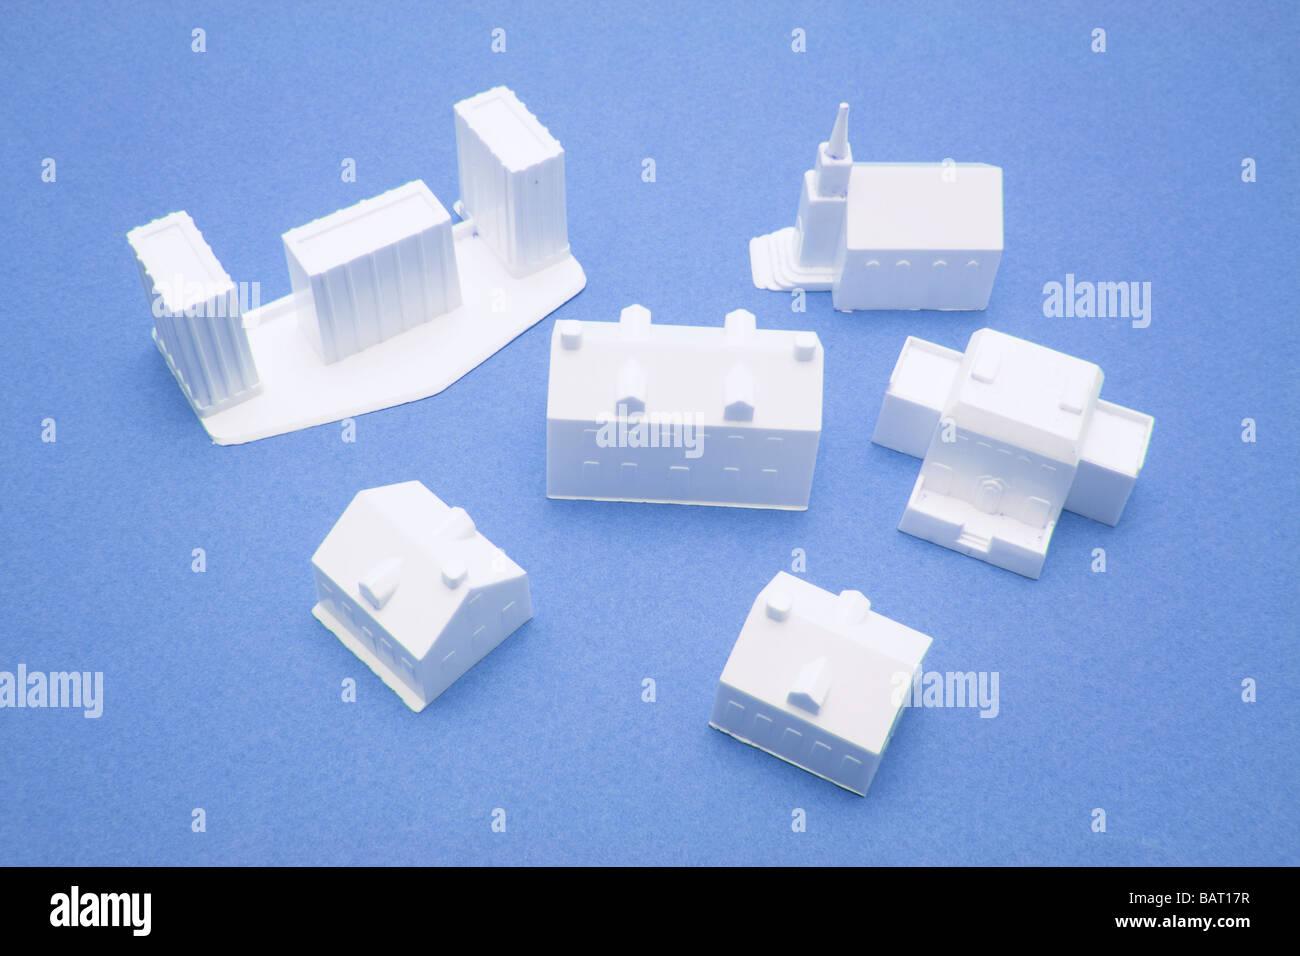 Miniature Building Models - Stock Image